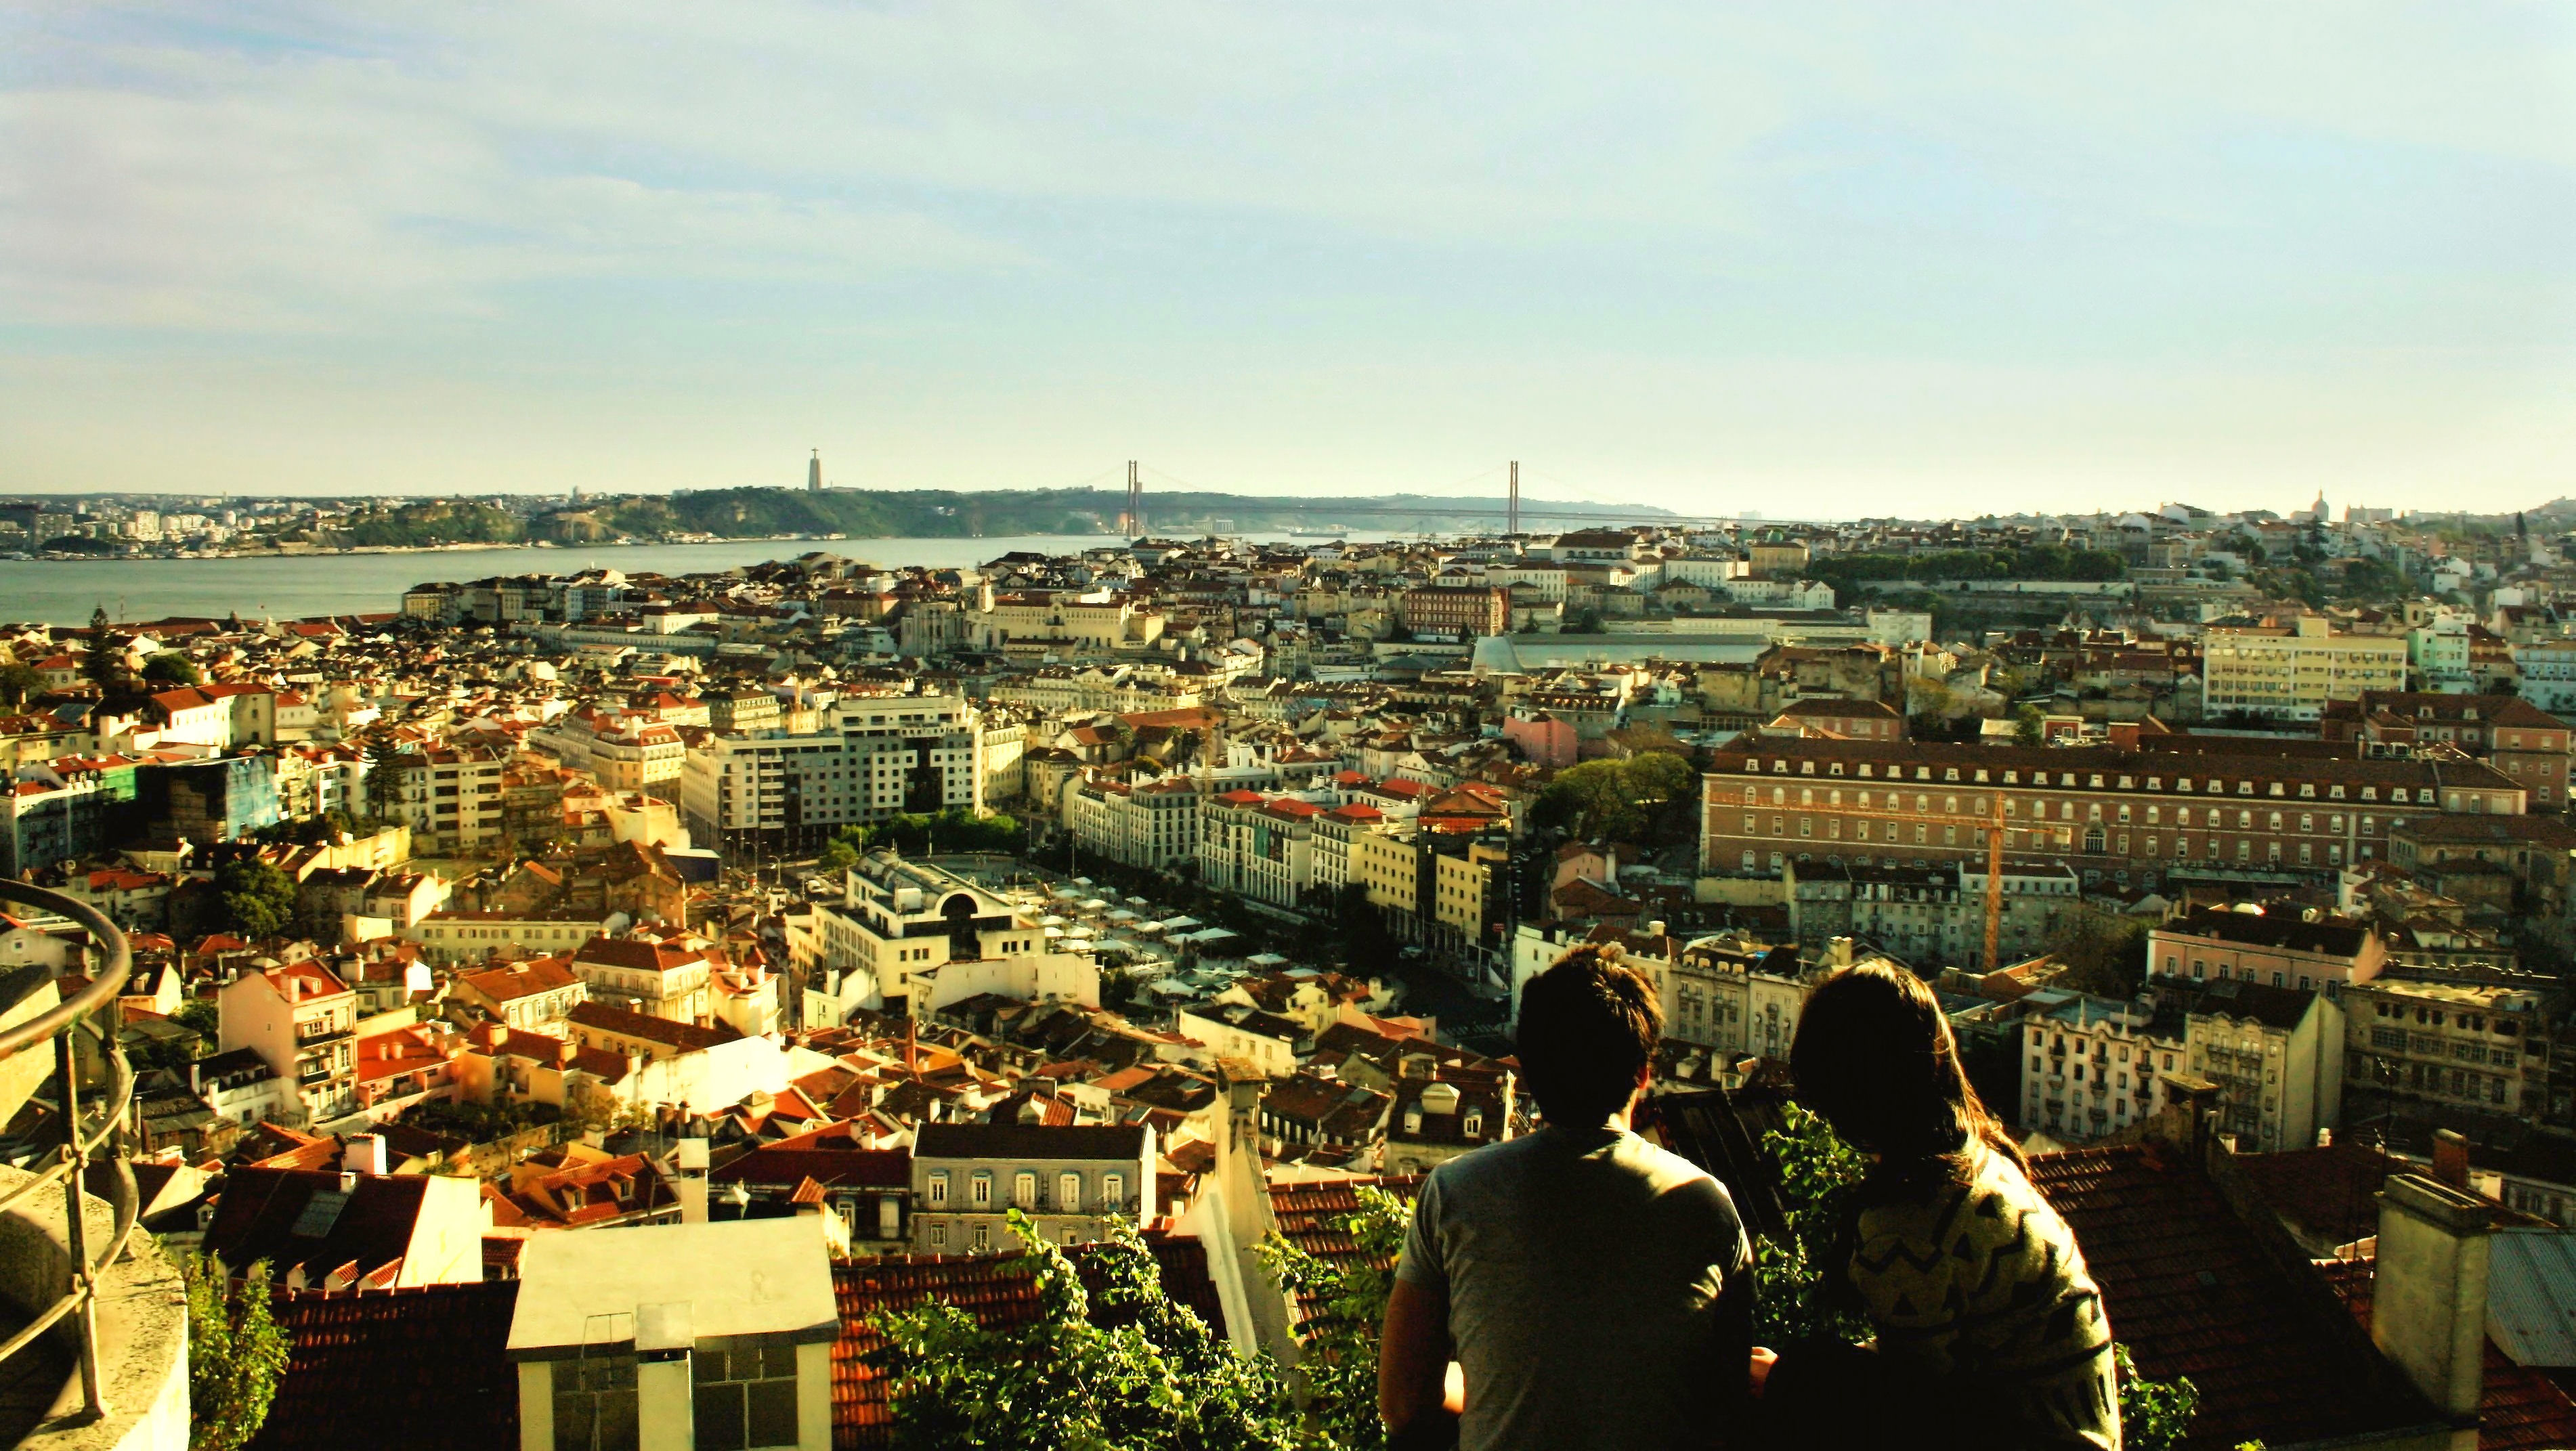 <h5>Lisboa II, Portugal</h5>